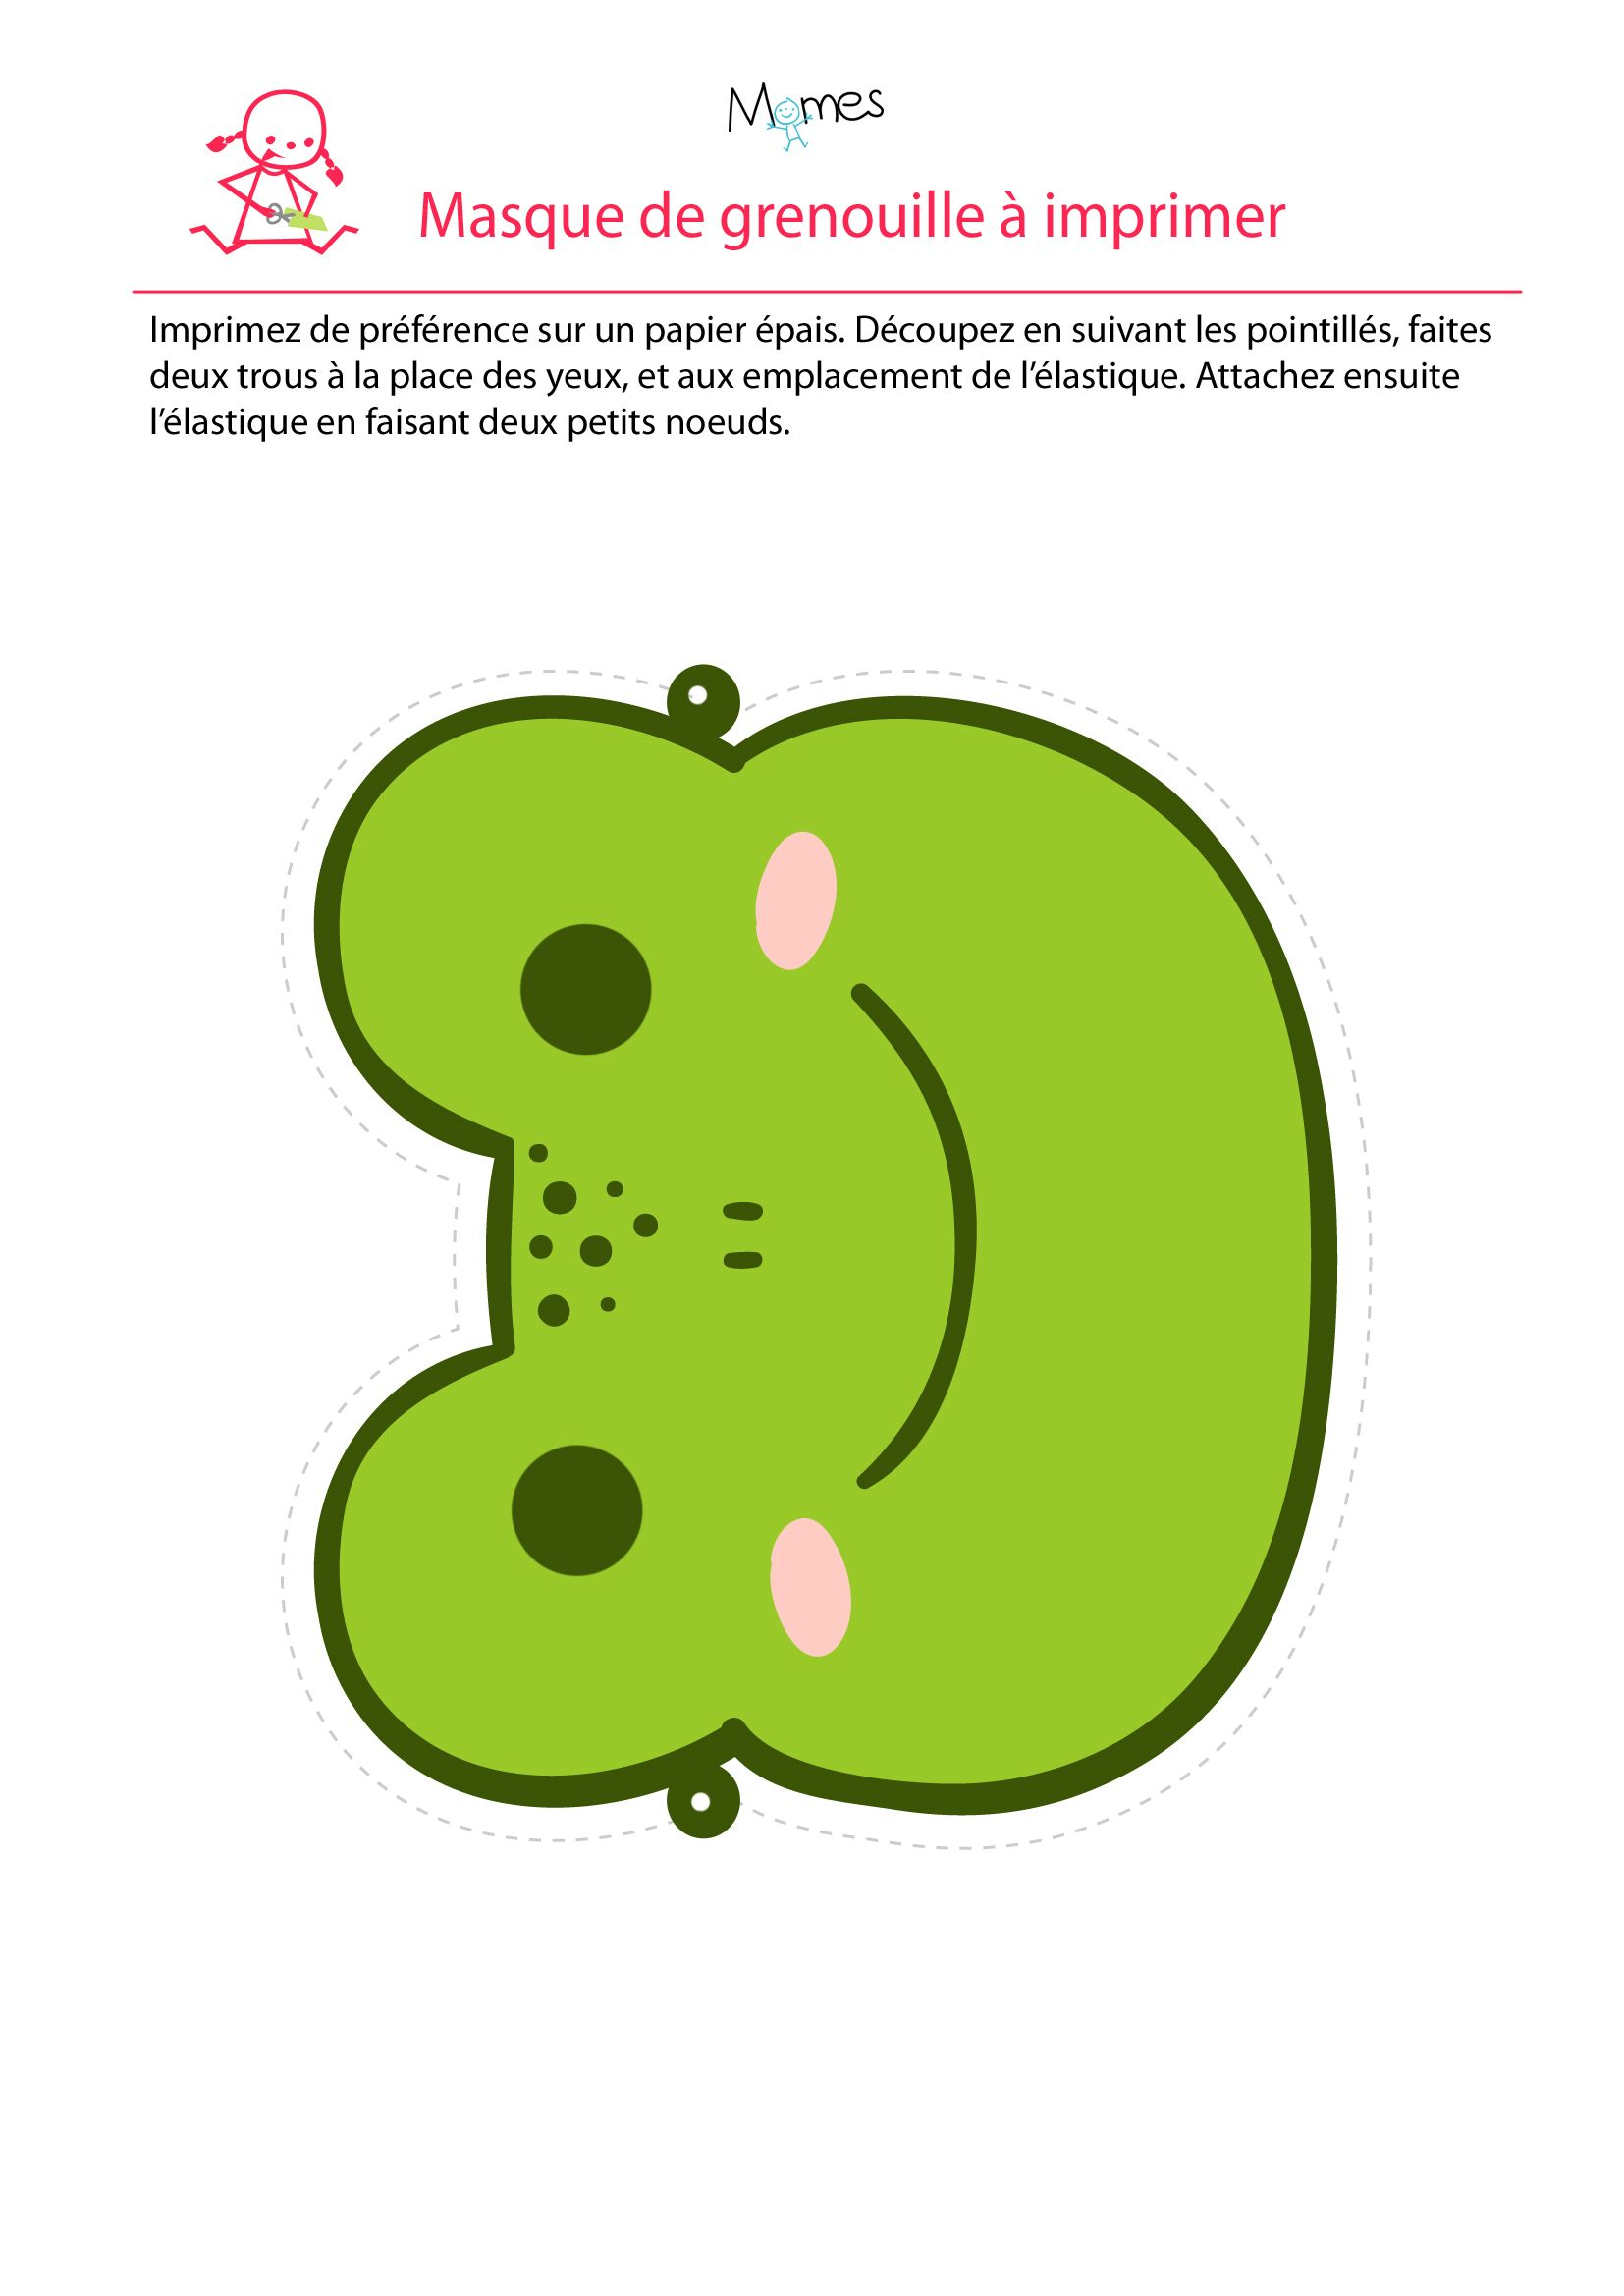 Masque de grenouille   Frogs and Mardi gras